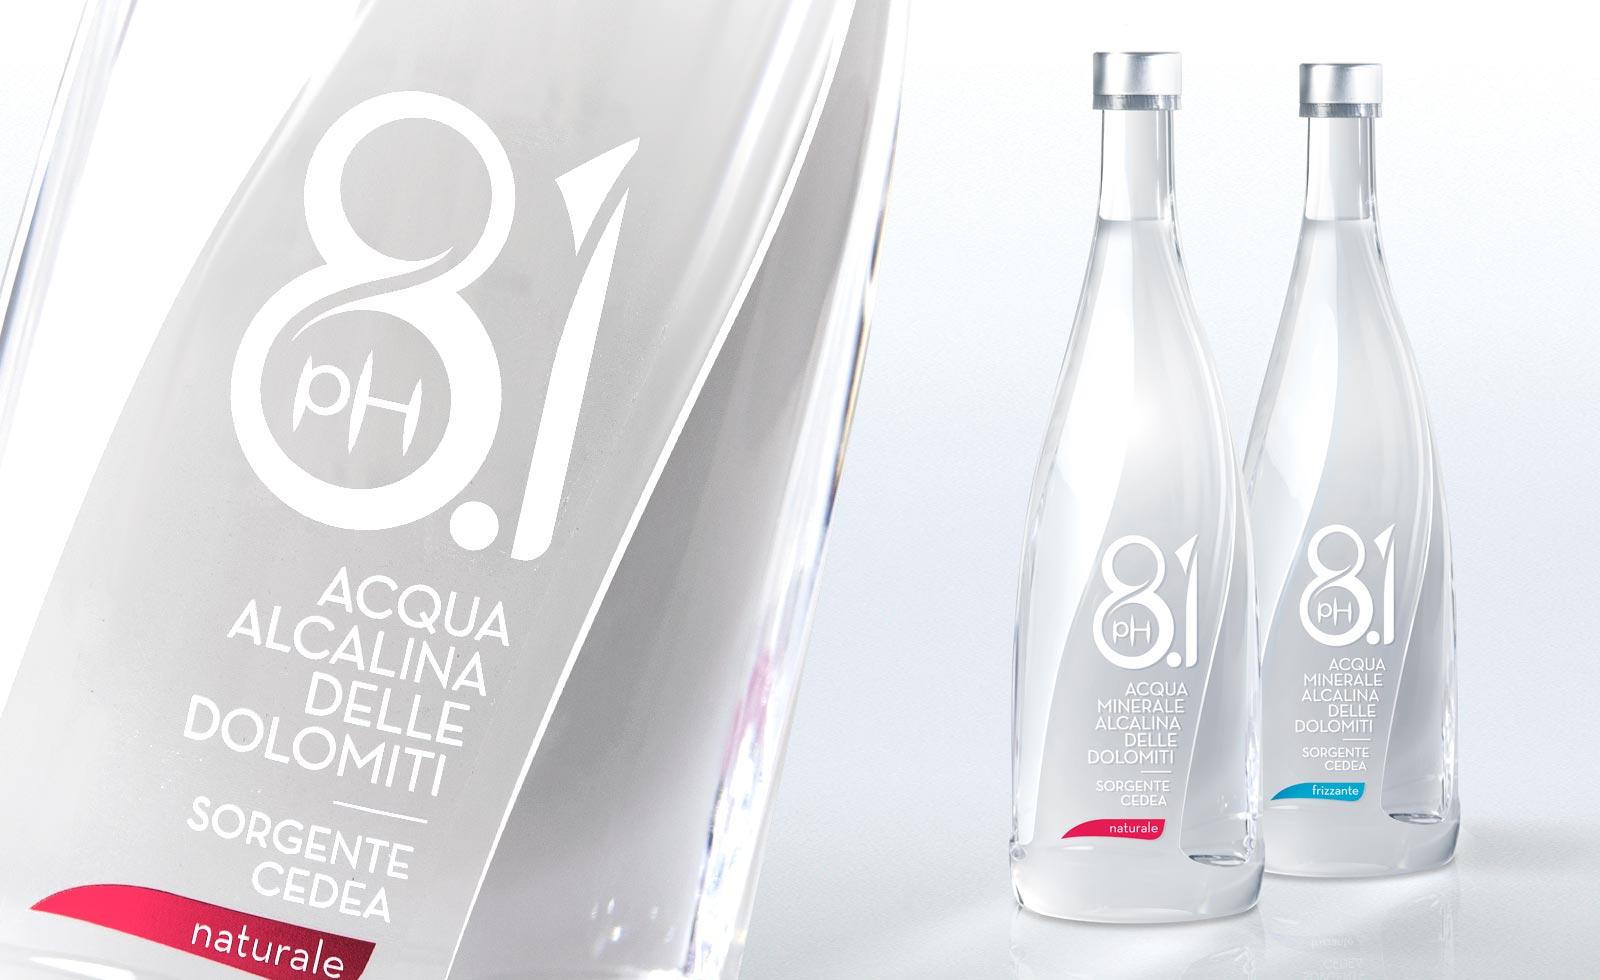 Cedea 8.1 dolomites mineral water